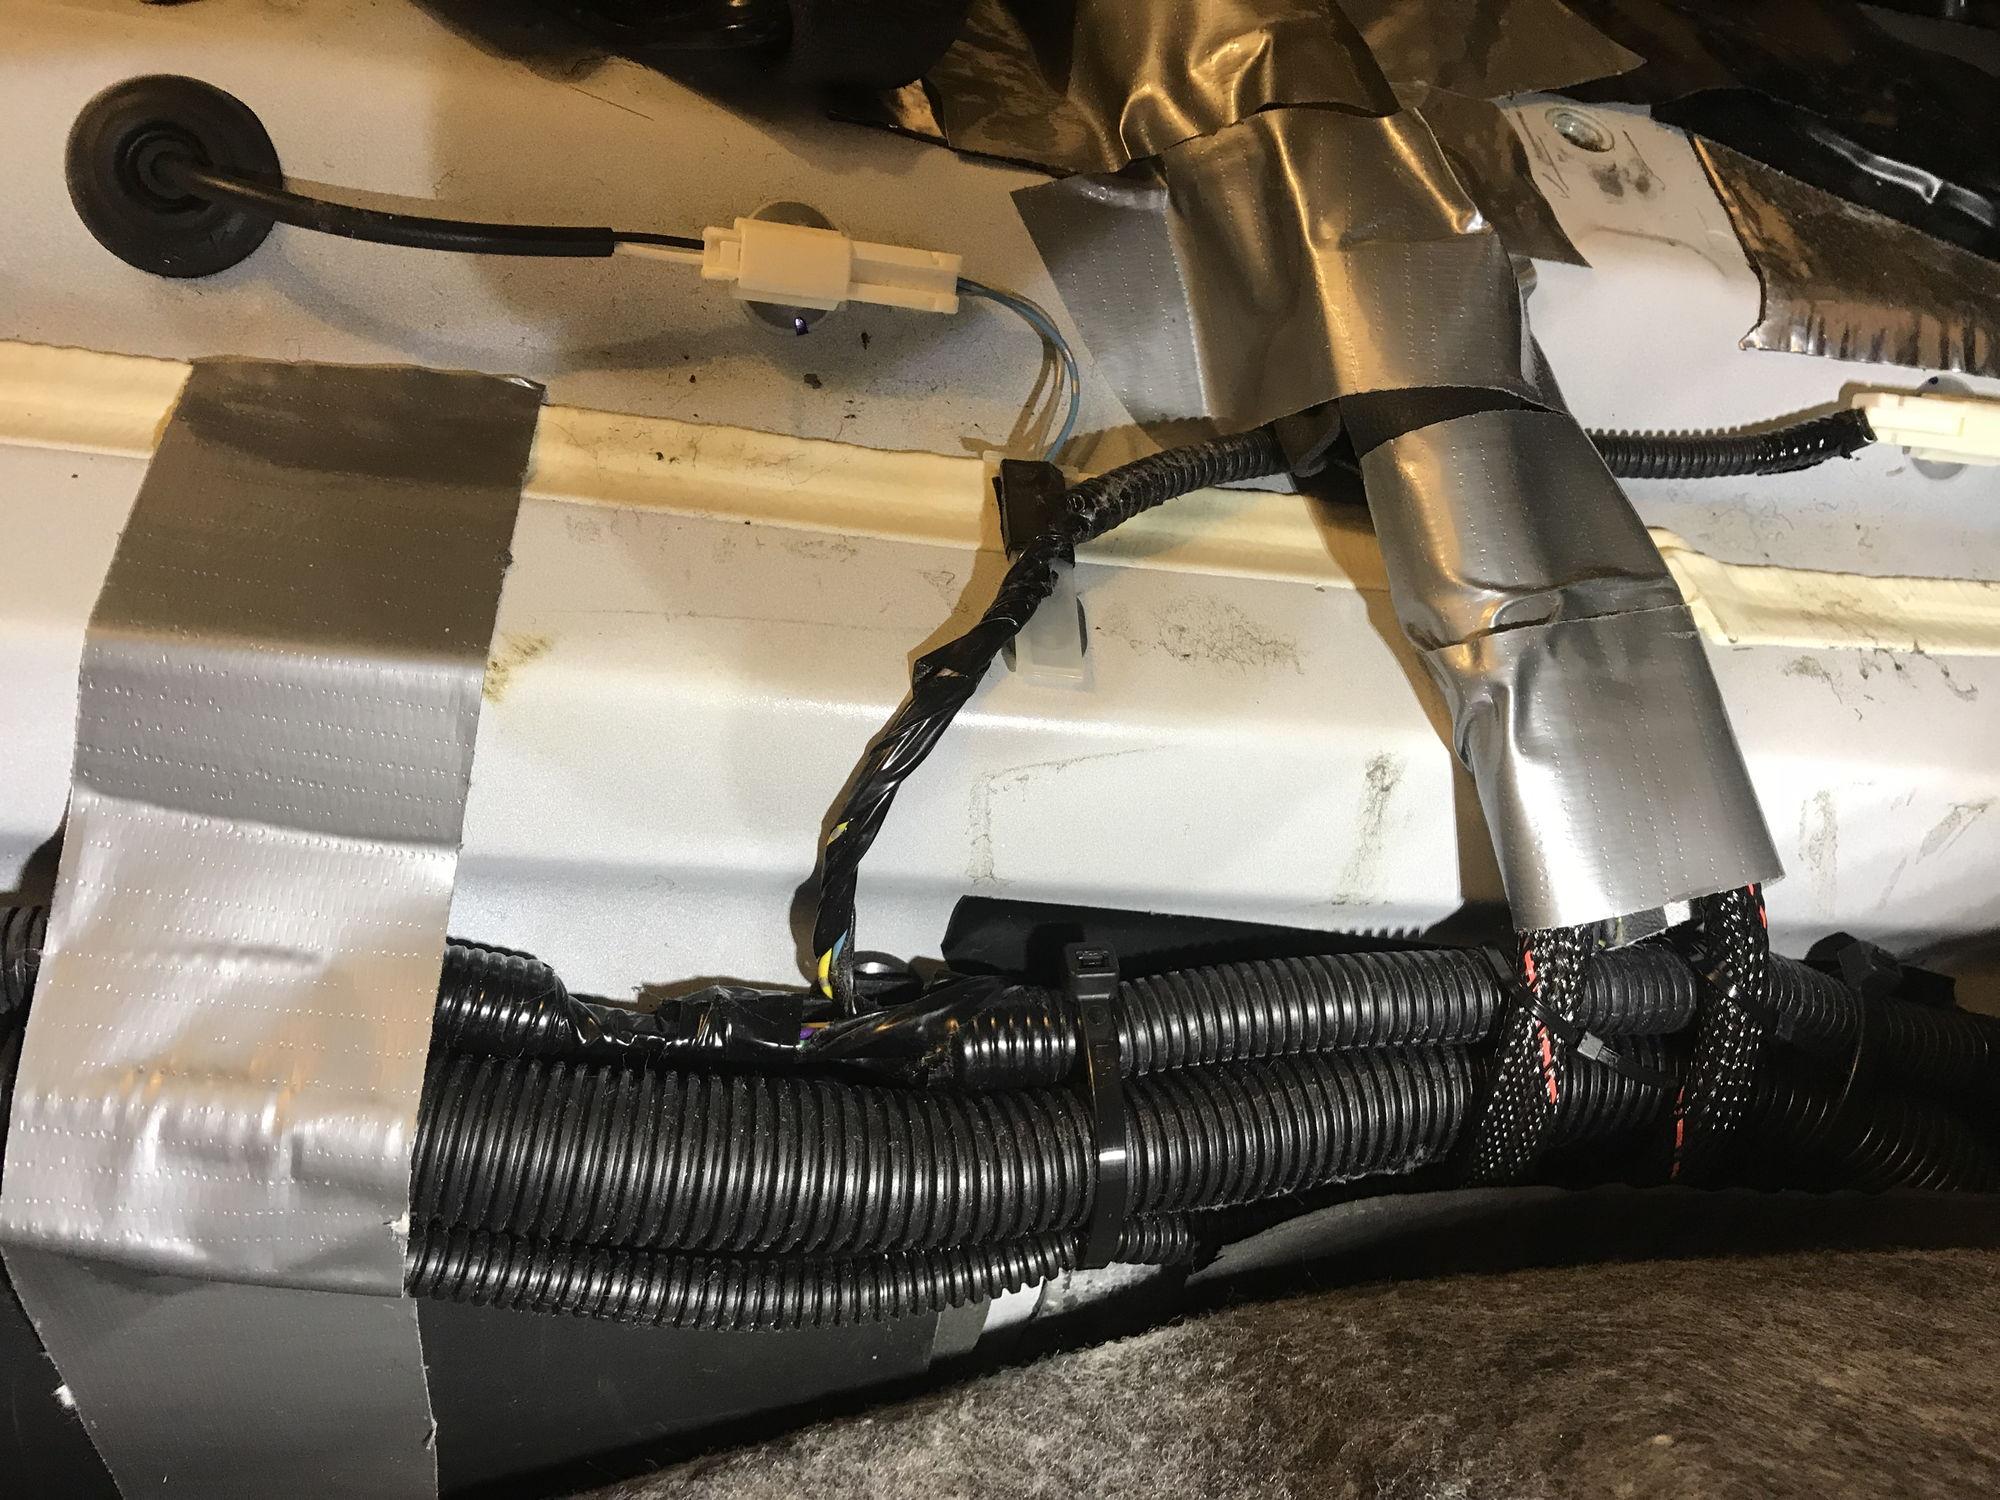 2013 Honda Fit Build Thread  Sony  Zapco  Dynaudio  Morel  Maybe Jl  Etc   - Page 5